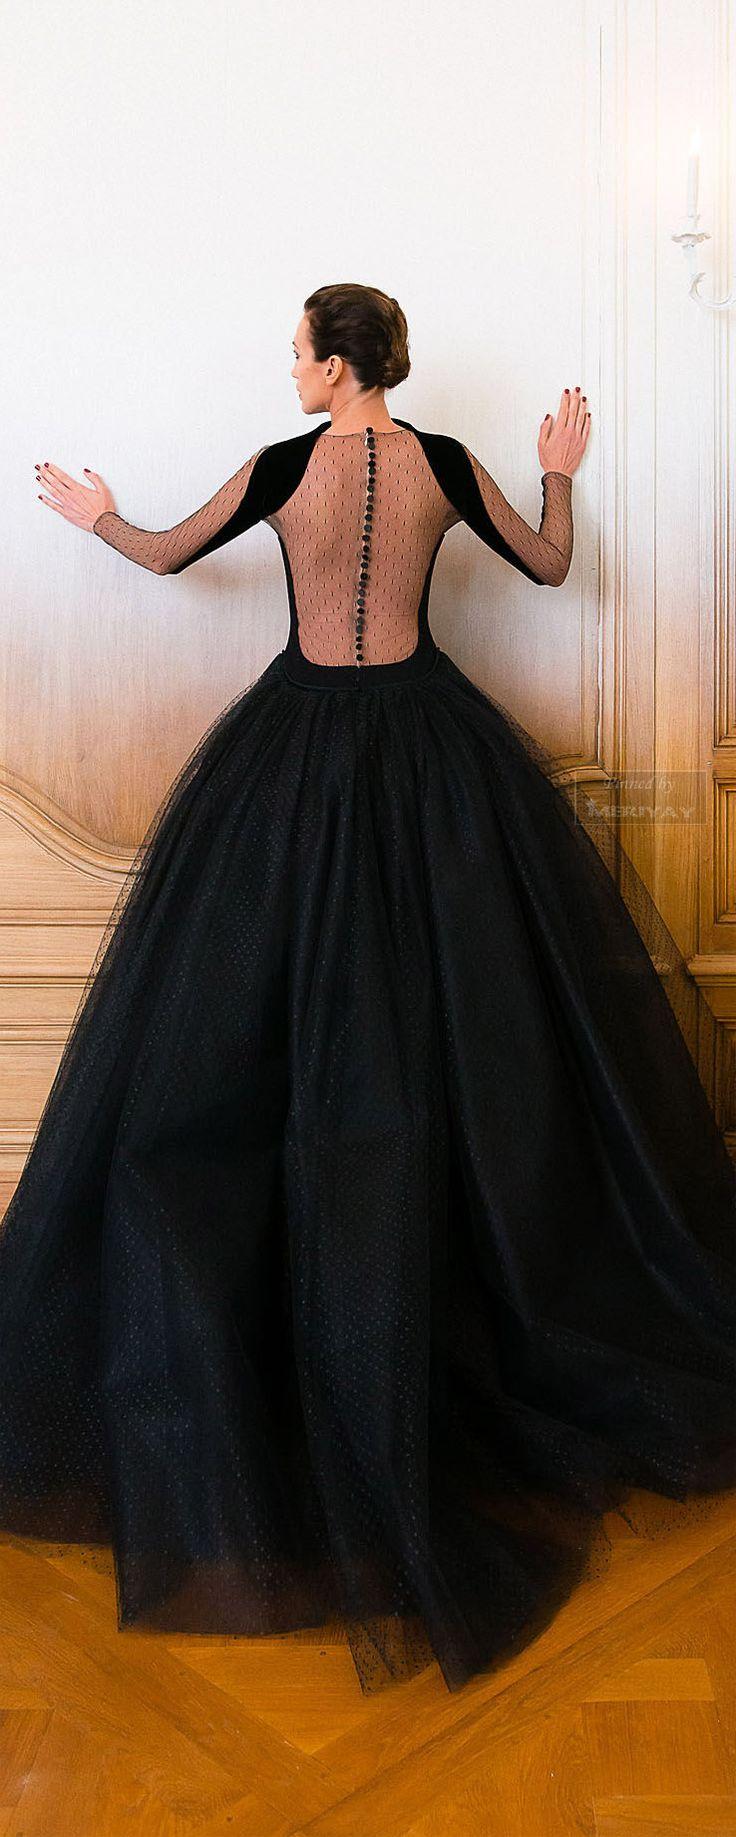 Stéphane Rolland so sexy black prom dress #promdress